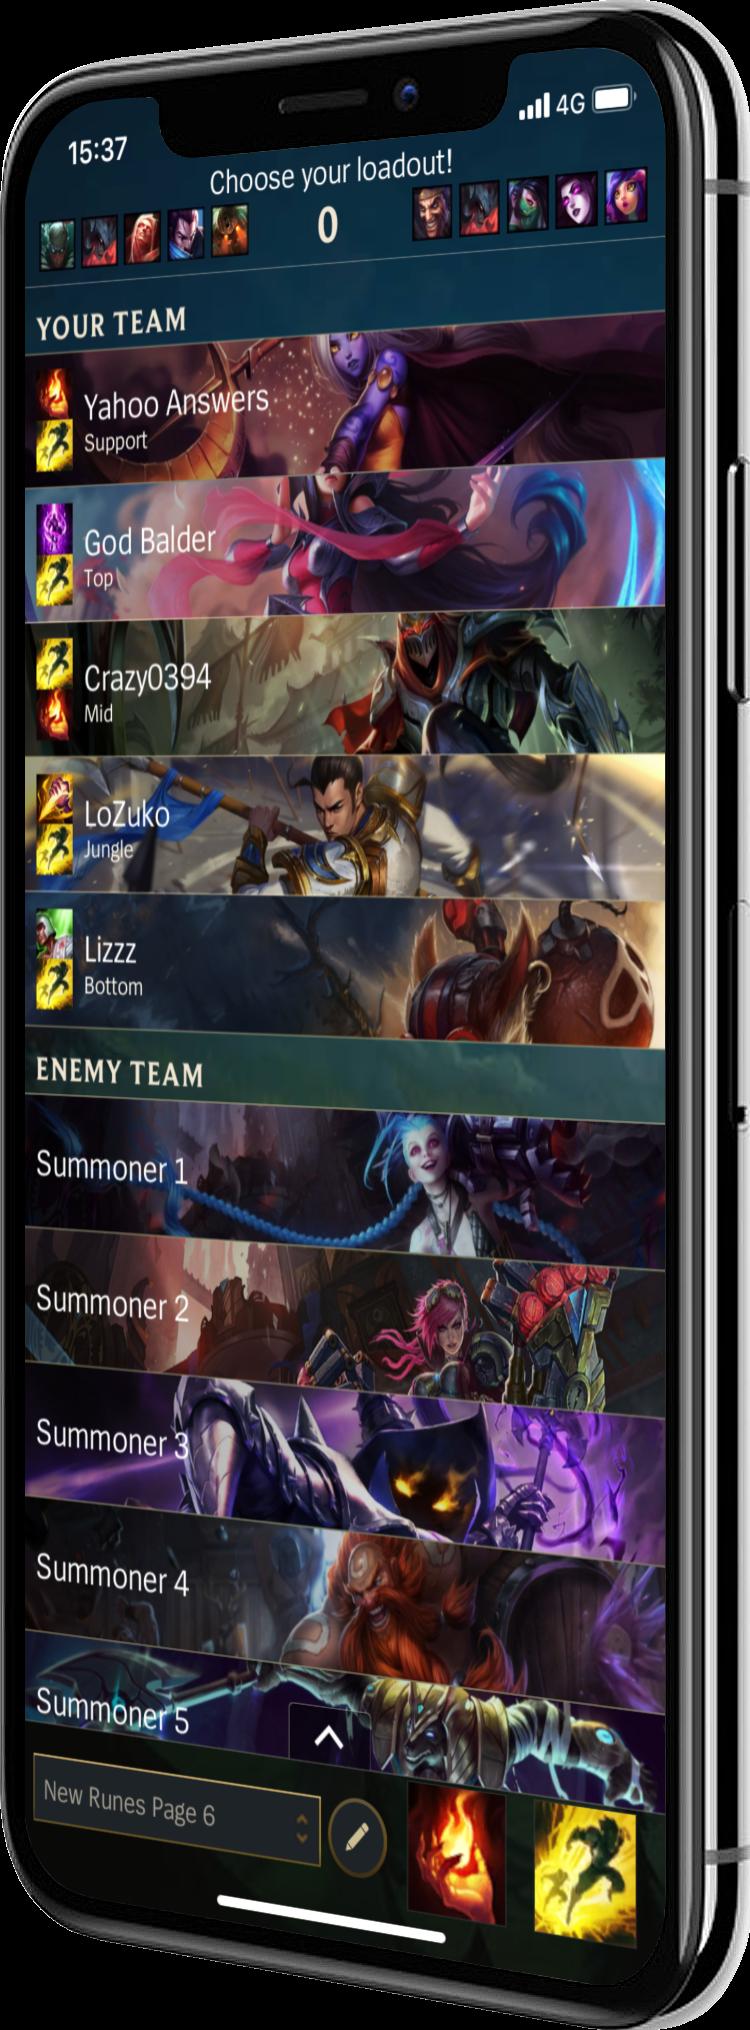 Mimic - A League Client On Your Phone